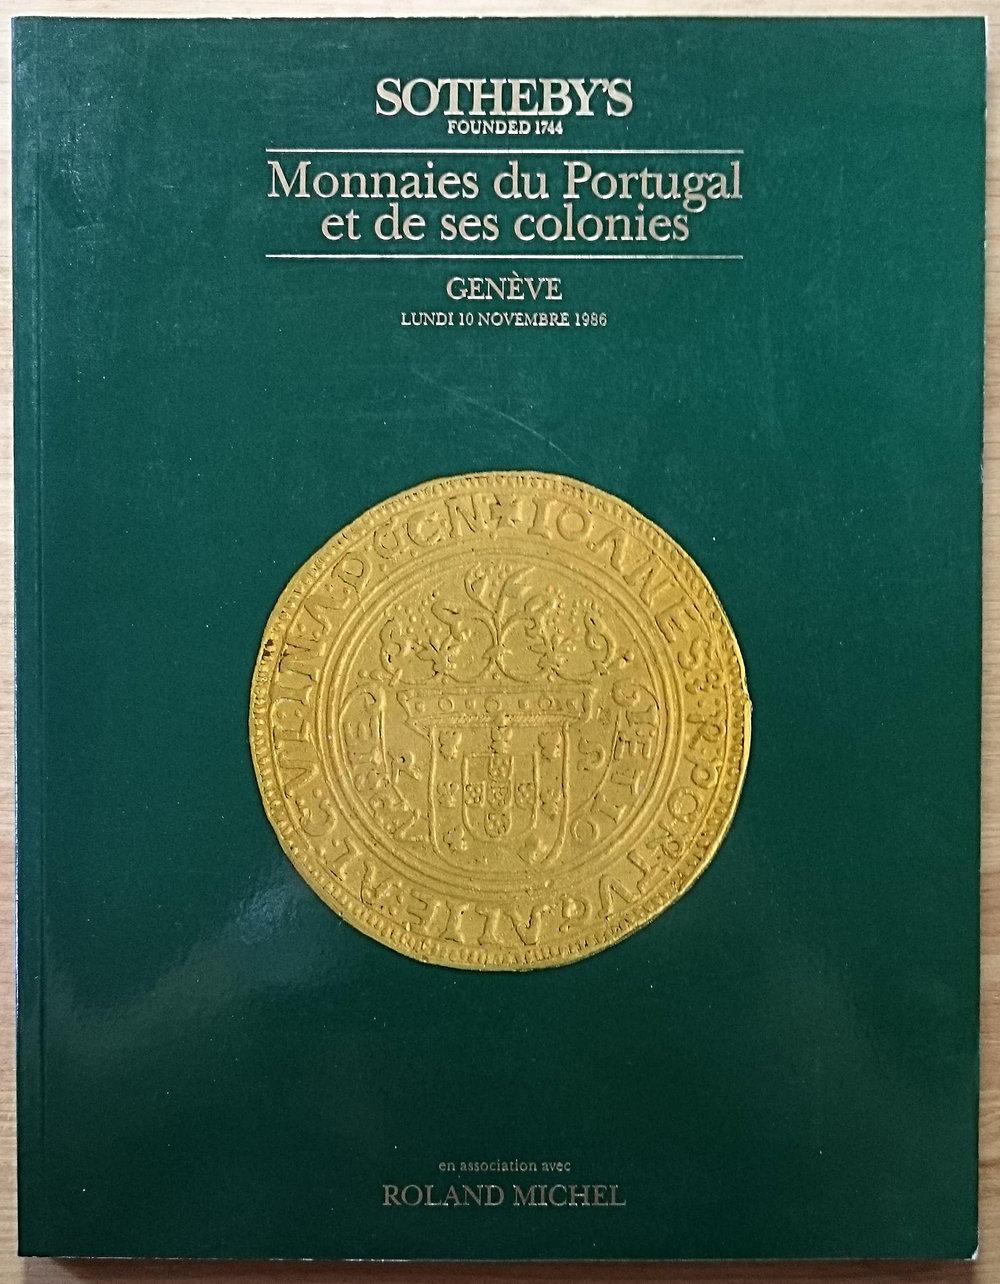 Moneta (Portuguese Edition)